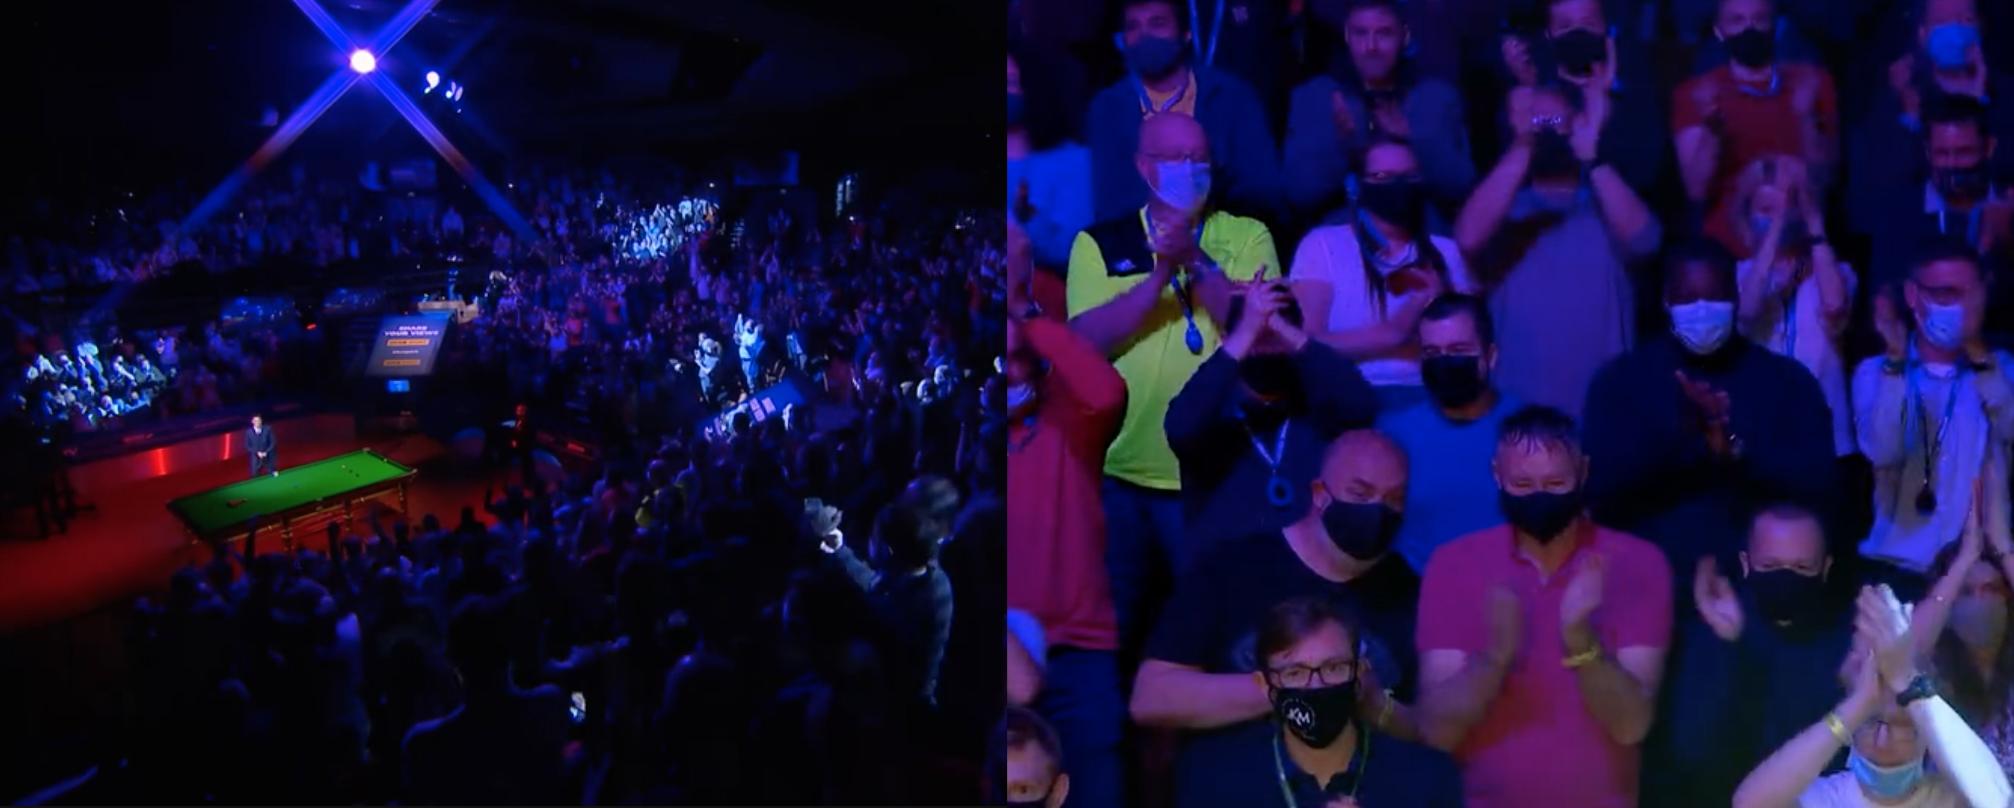 Indoor spectators returned for the 2021 Snooker World Championship